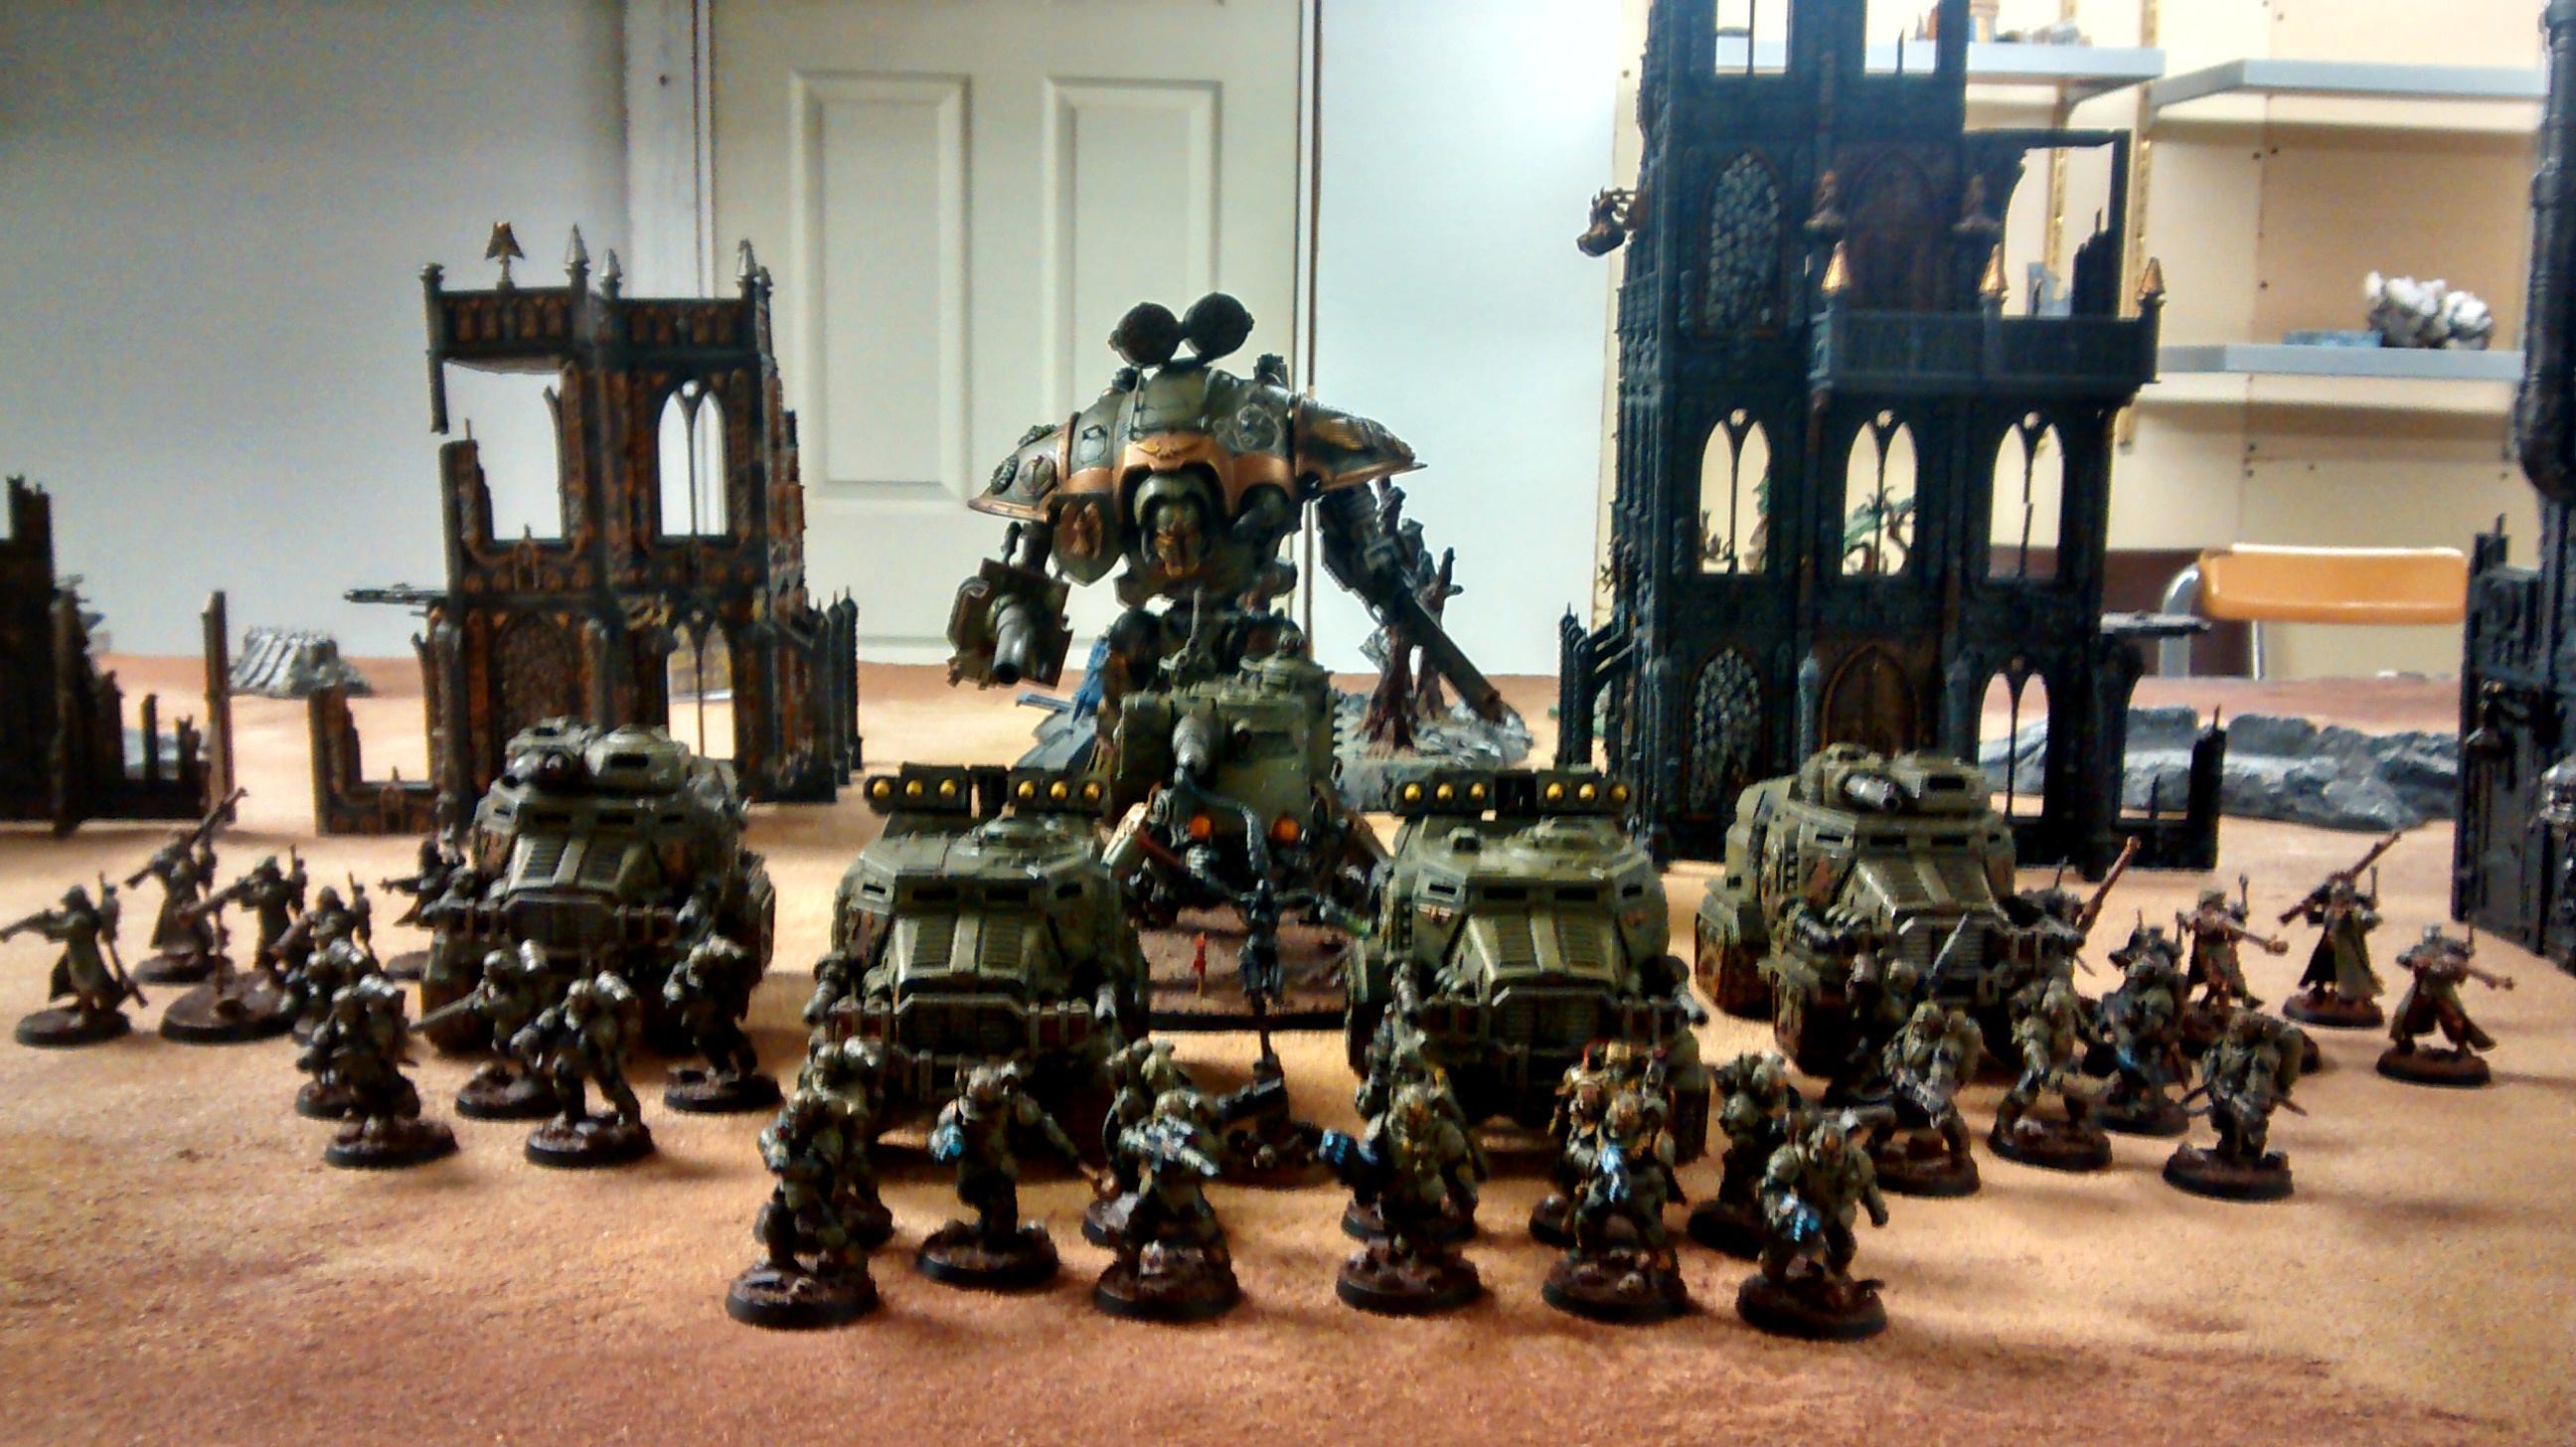 Assassin, Delta Mantises, Imperial Knight, Scion, Scions, Skitarii, Taurox